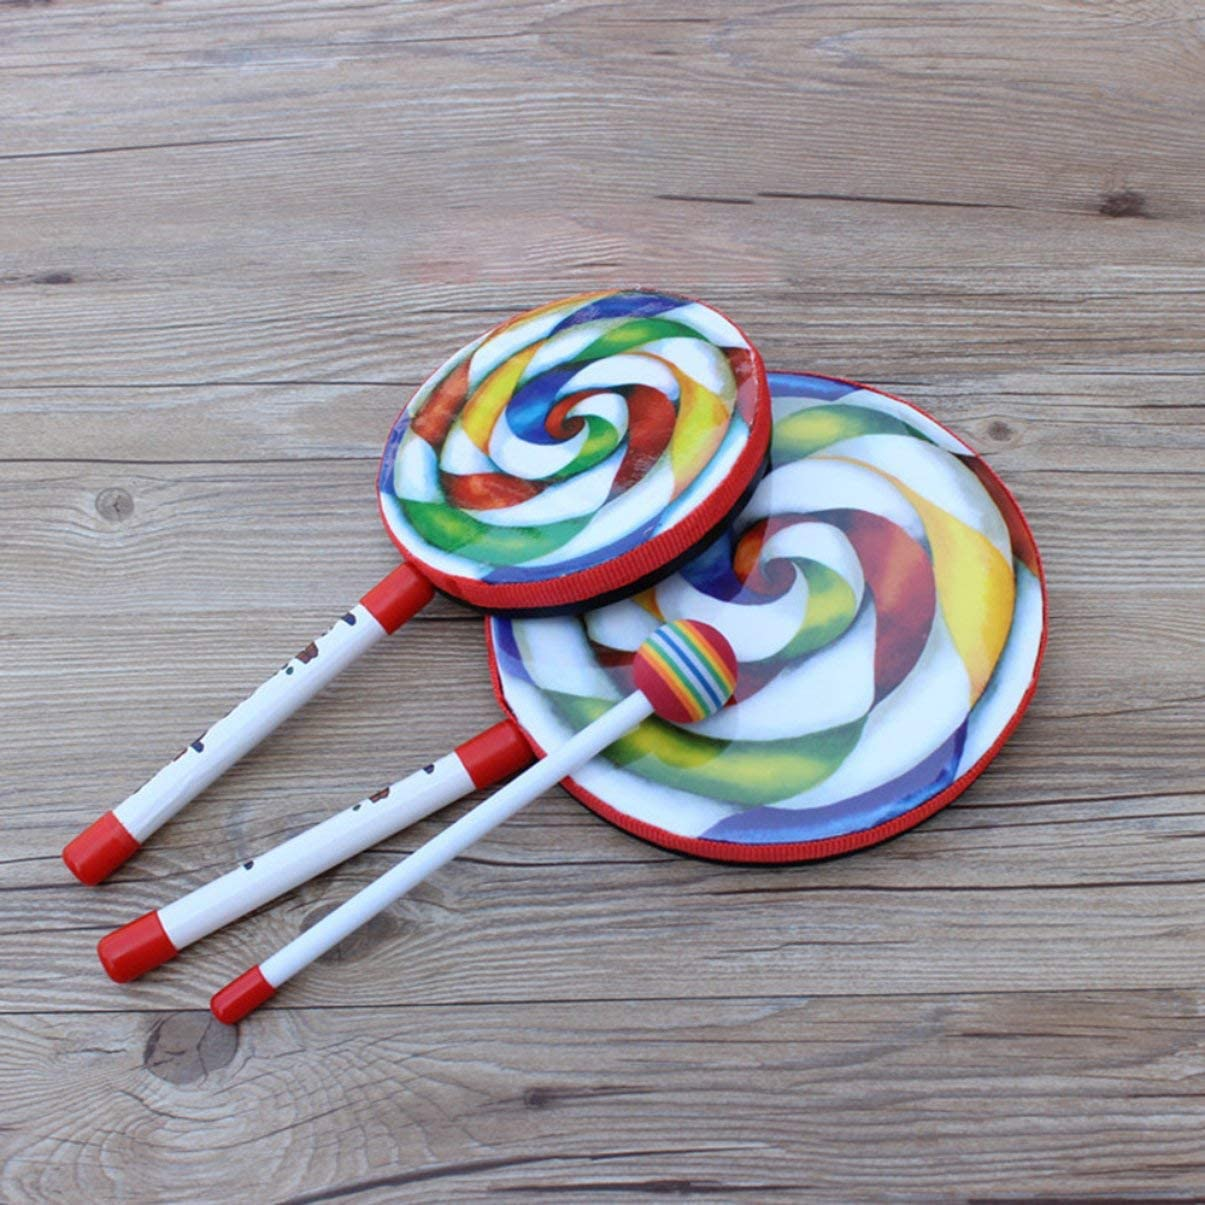 FHJZXDGHNXFGH Rainbow Blow Lollipop Drum Orff Instrumento Musical M/úsica para ni/ños Juguete de percusi/ón Kindergarten Ense/ñanza temprana